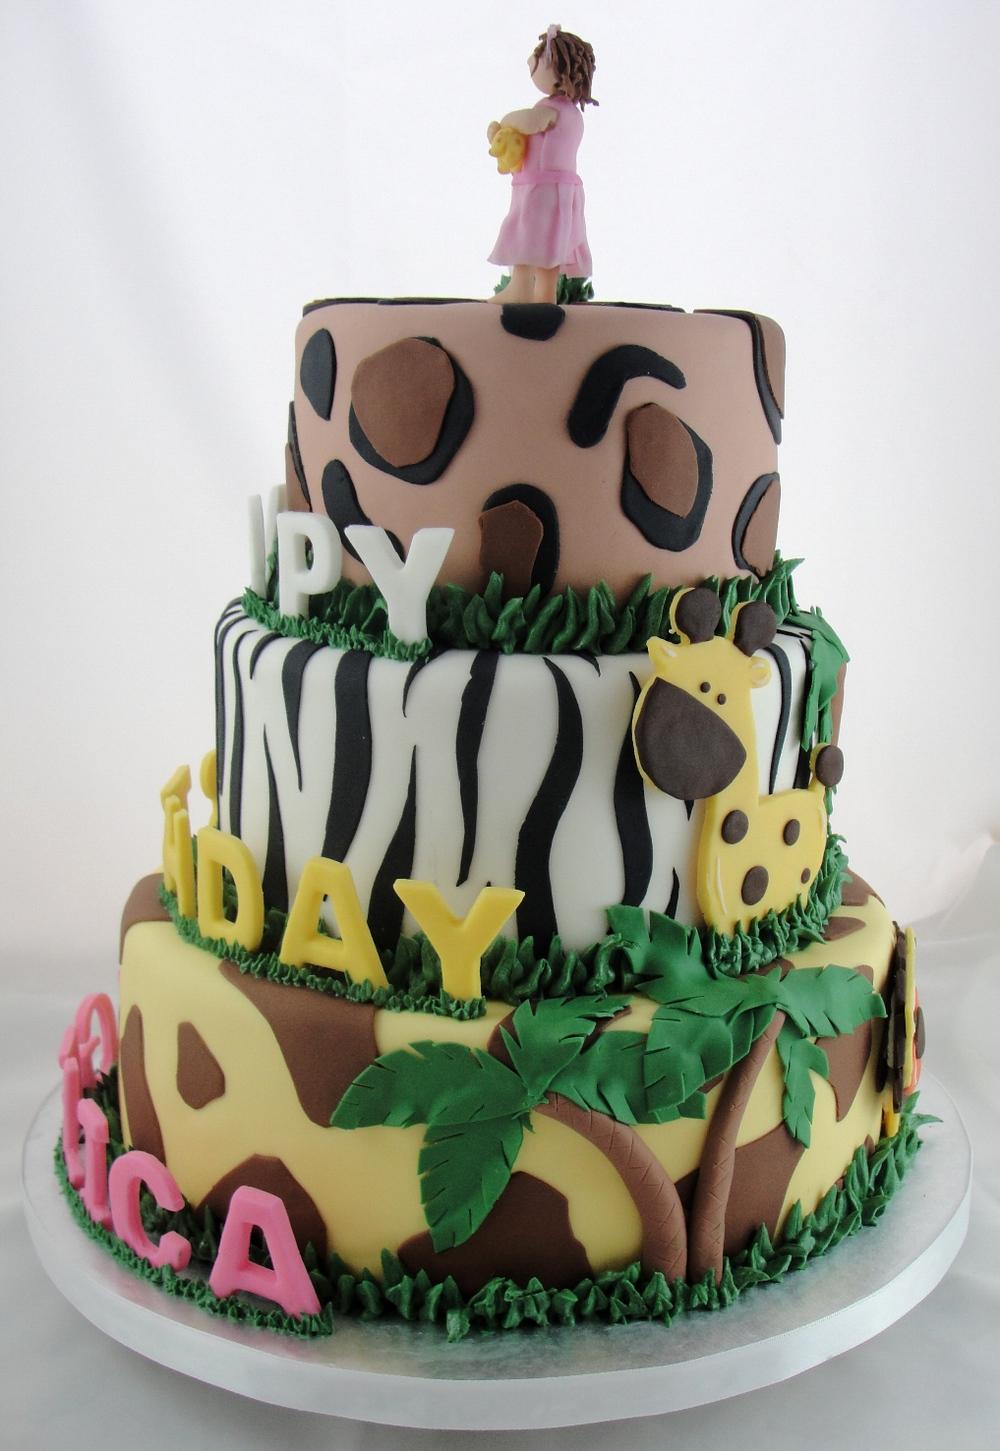 LBC 1403 - Jungle Cake 2.jpg